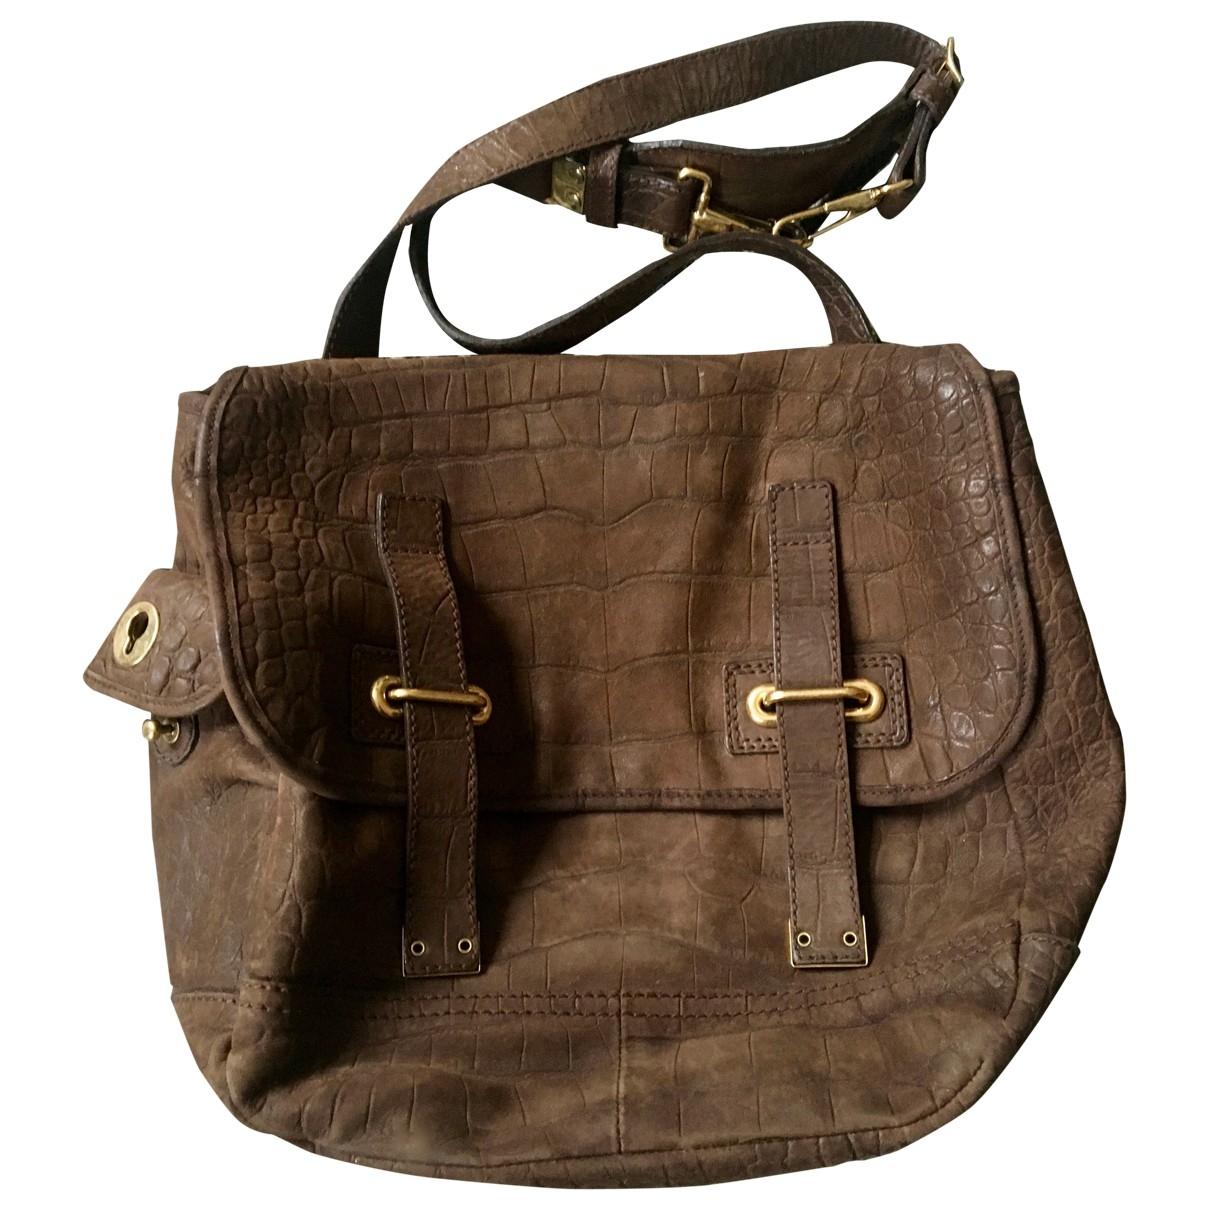 Yves Saint Laurent Messenger Handtasche in  Braun Leder